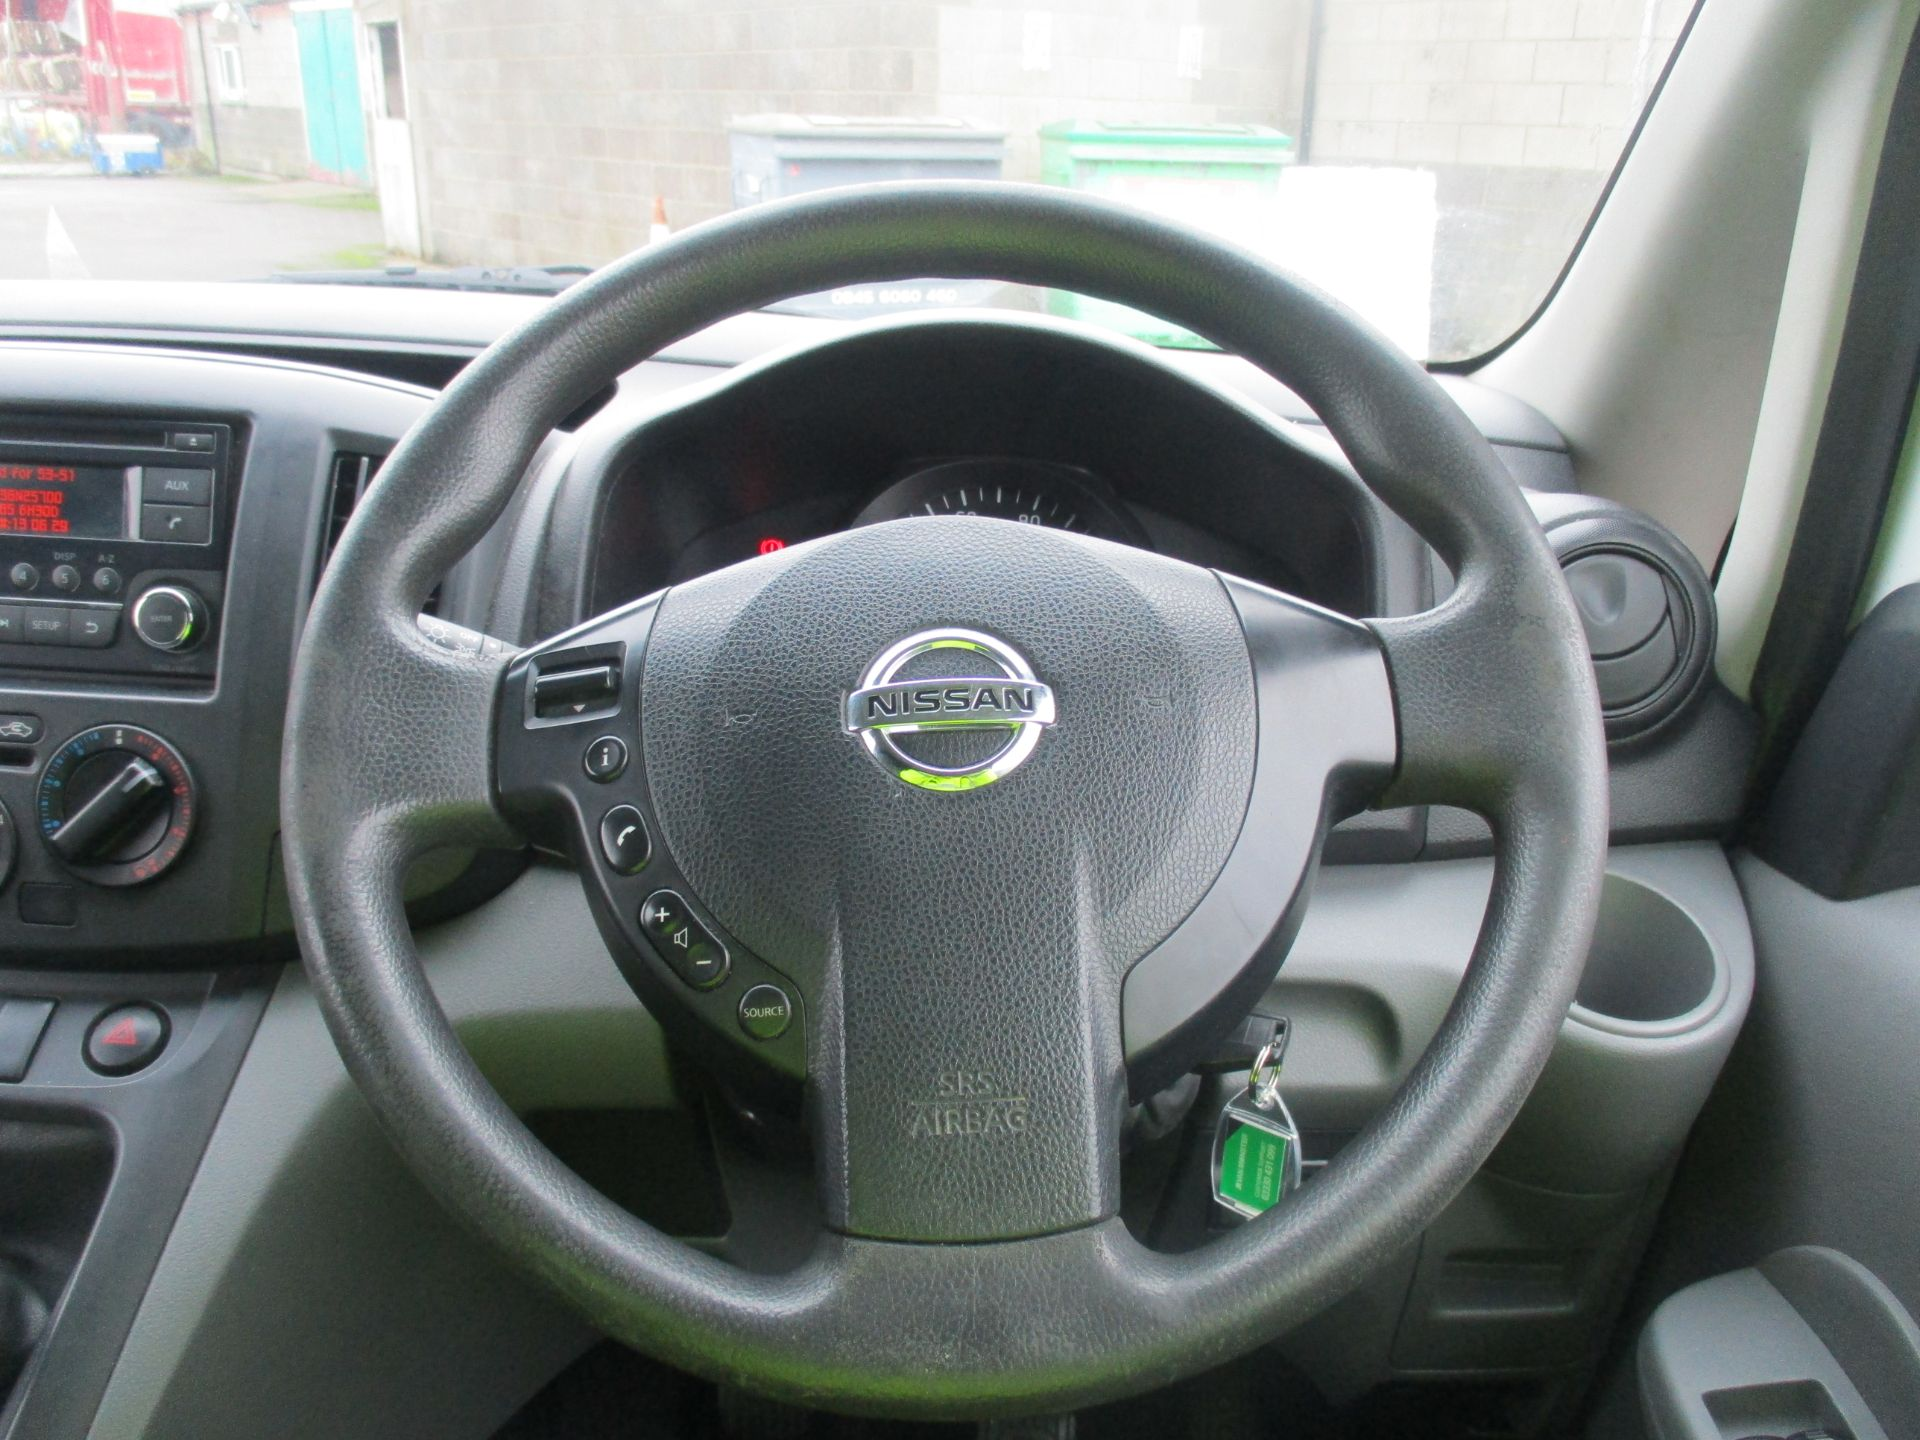 2014 Nissan Nv200 1.5 DCI ACENTA EURO 5 (SJ14YBR) Image 17